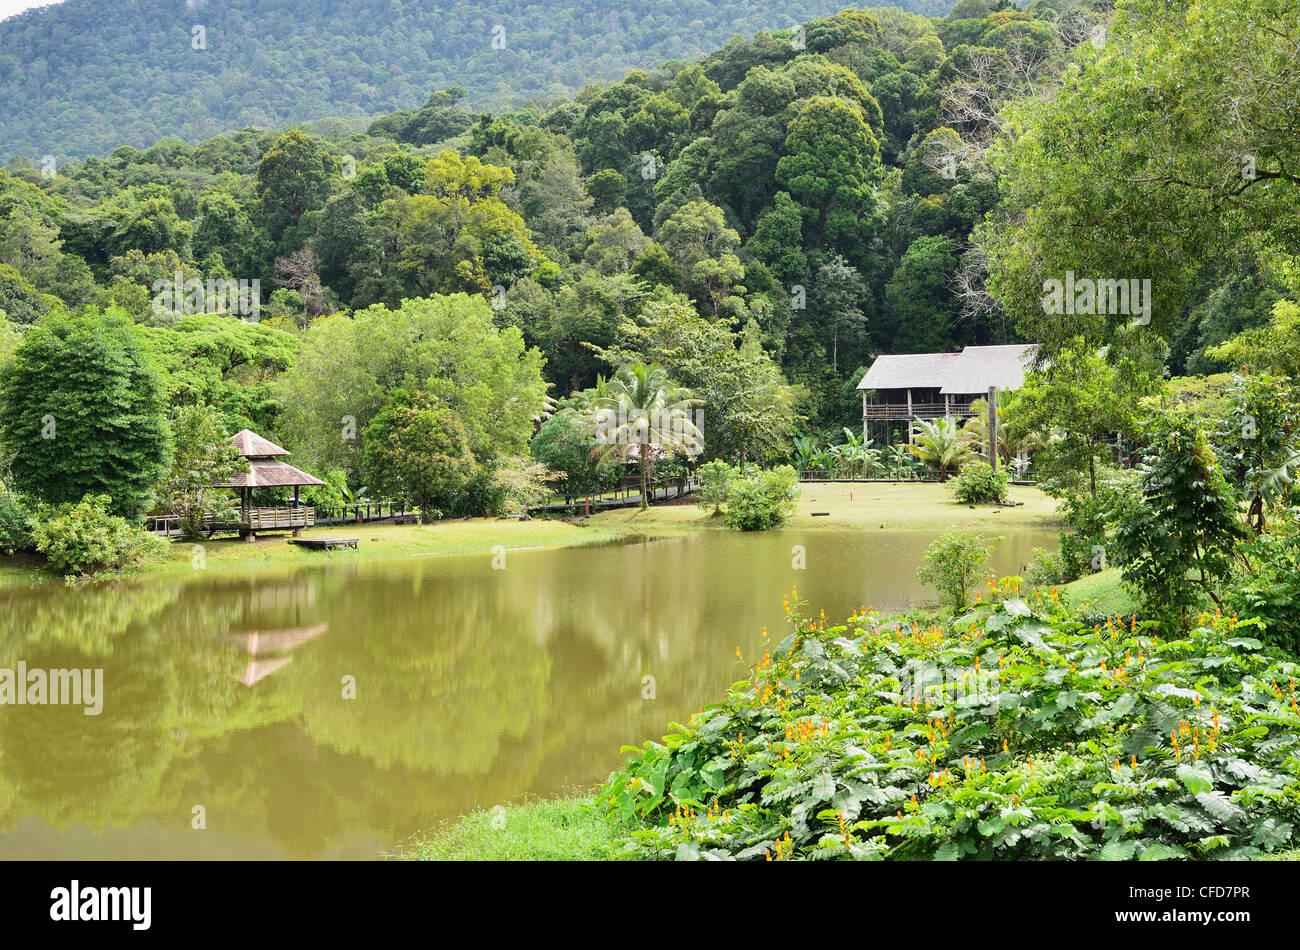 Sarawak Cultural Village, Sarawak, Borneo, Malaysia, Southeast Asia, Asia - Stock Image